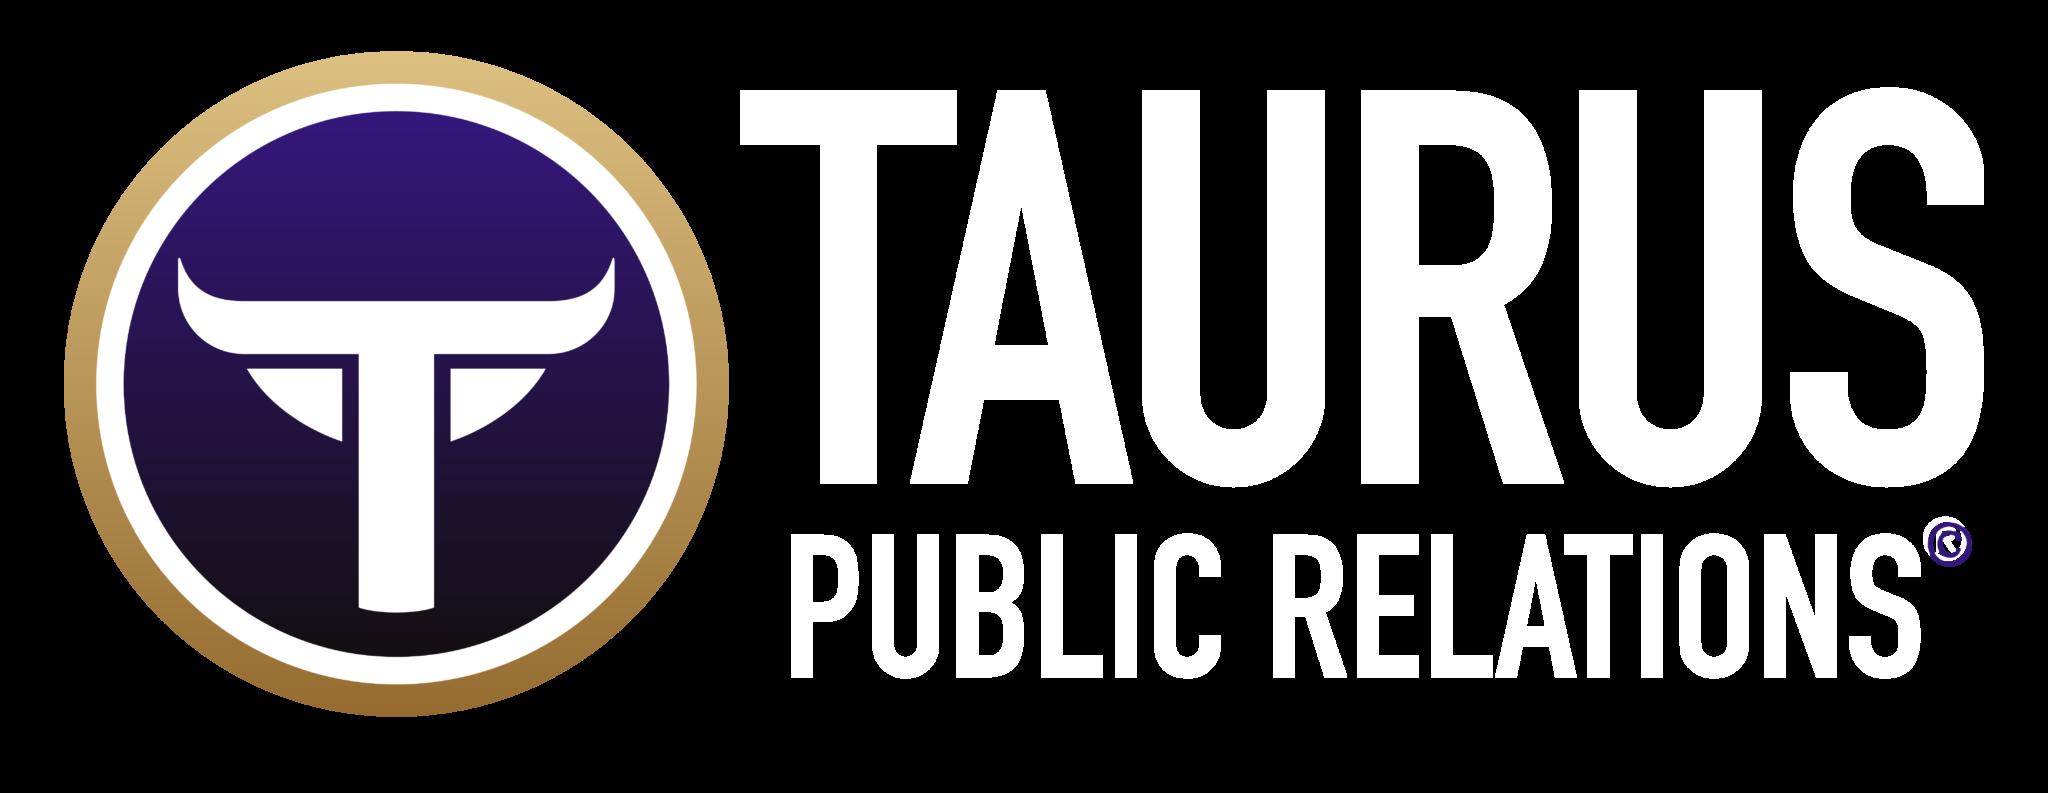 Taurus Marketing logos 52